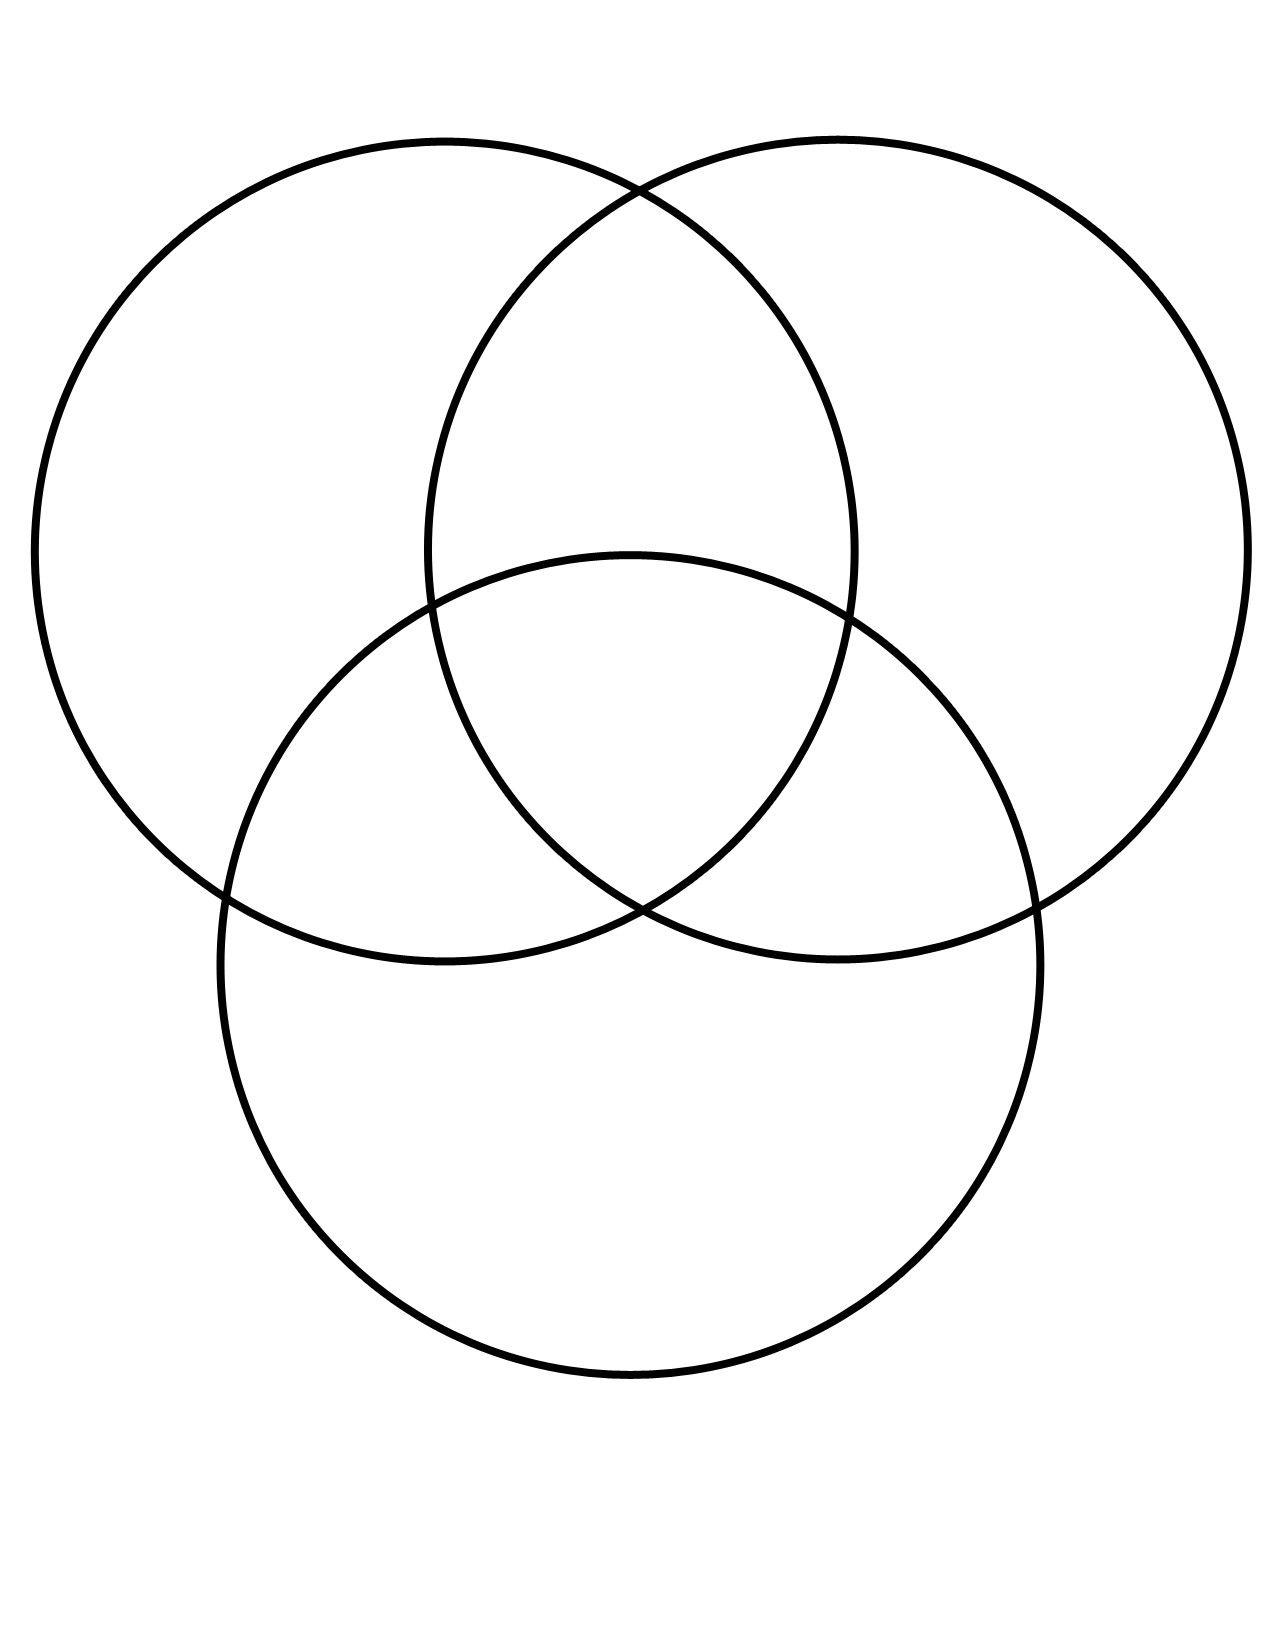 8 Venn Diagram Word Problems With 3 Circles Worksheet